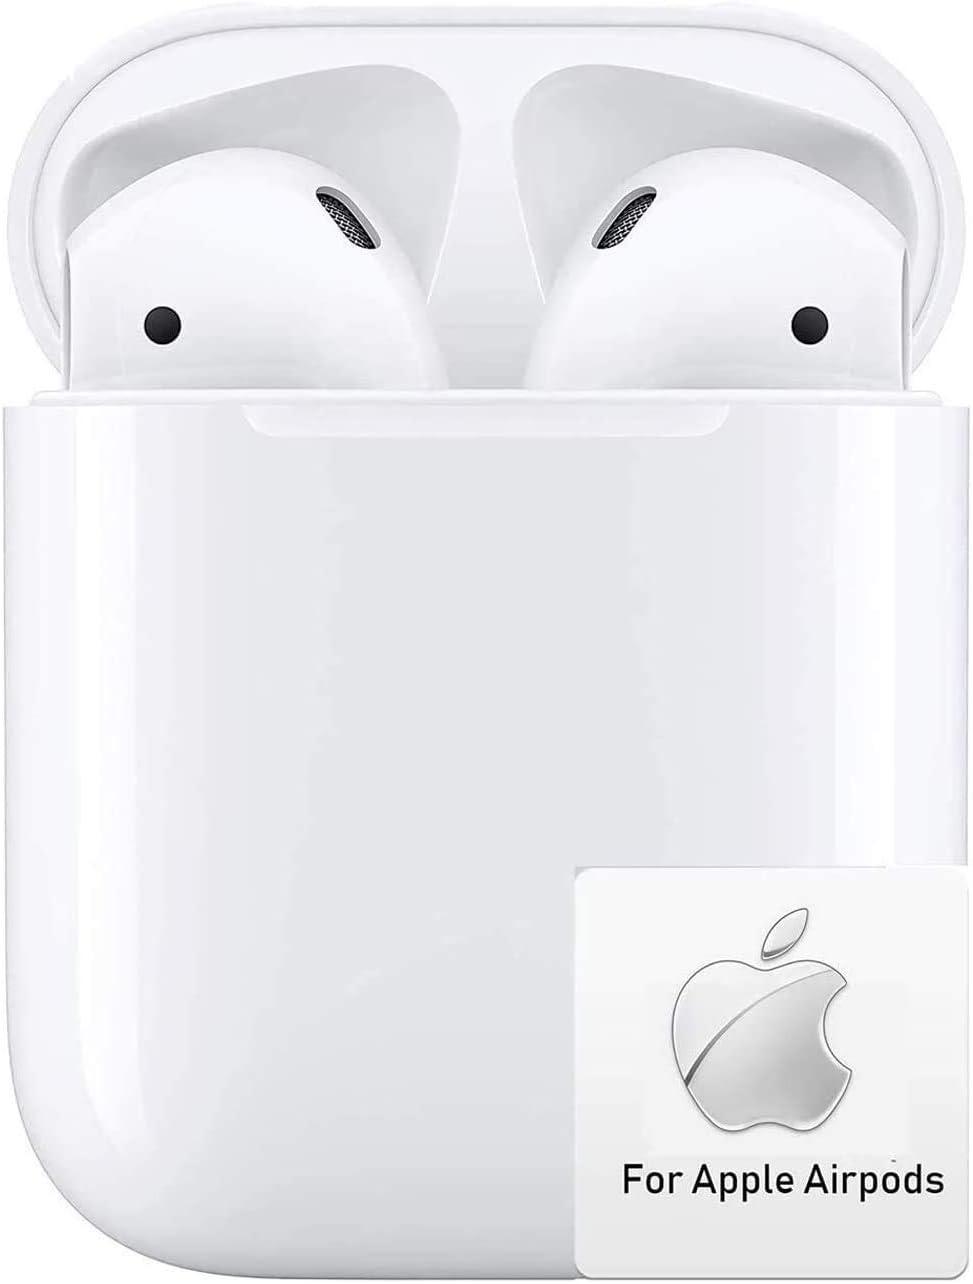 2020 Neue kabellose Bluetooth-Kopfh/örer XG1 Stereo-In-Ear-Kopfh/örer mit tragbarer Ladeh/ülle f/ür iOS und Android Bluetooth-Headsets